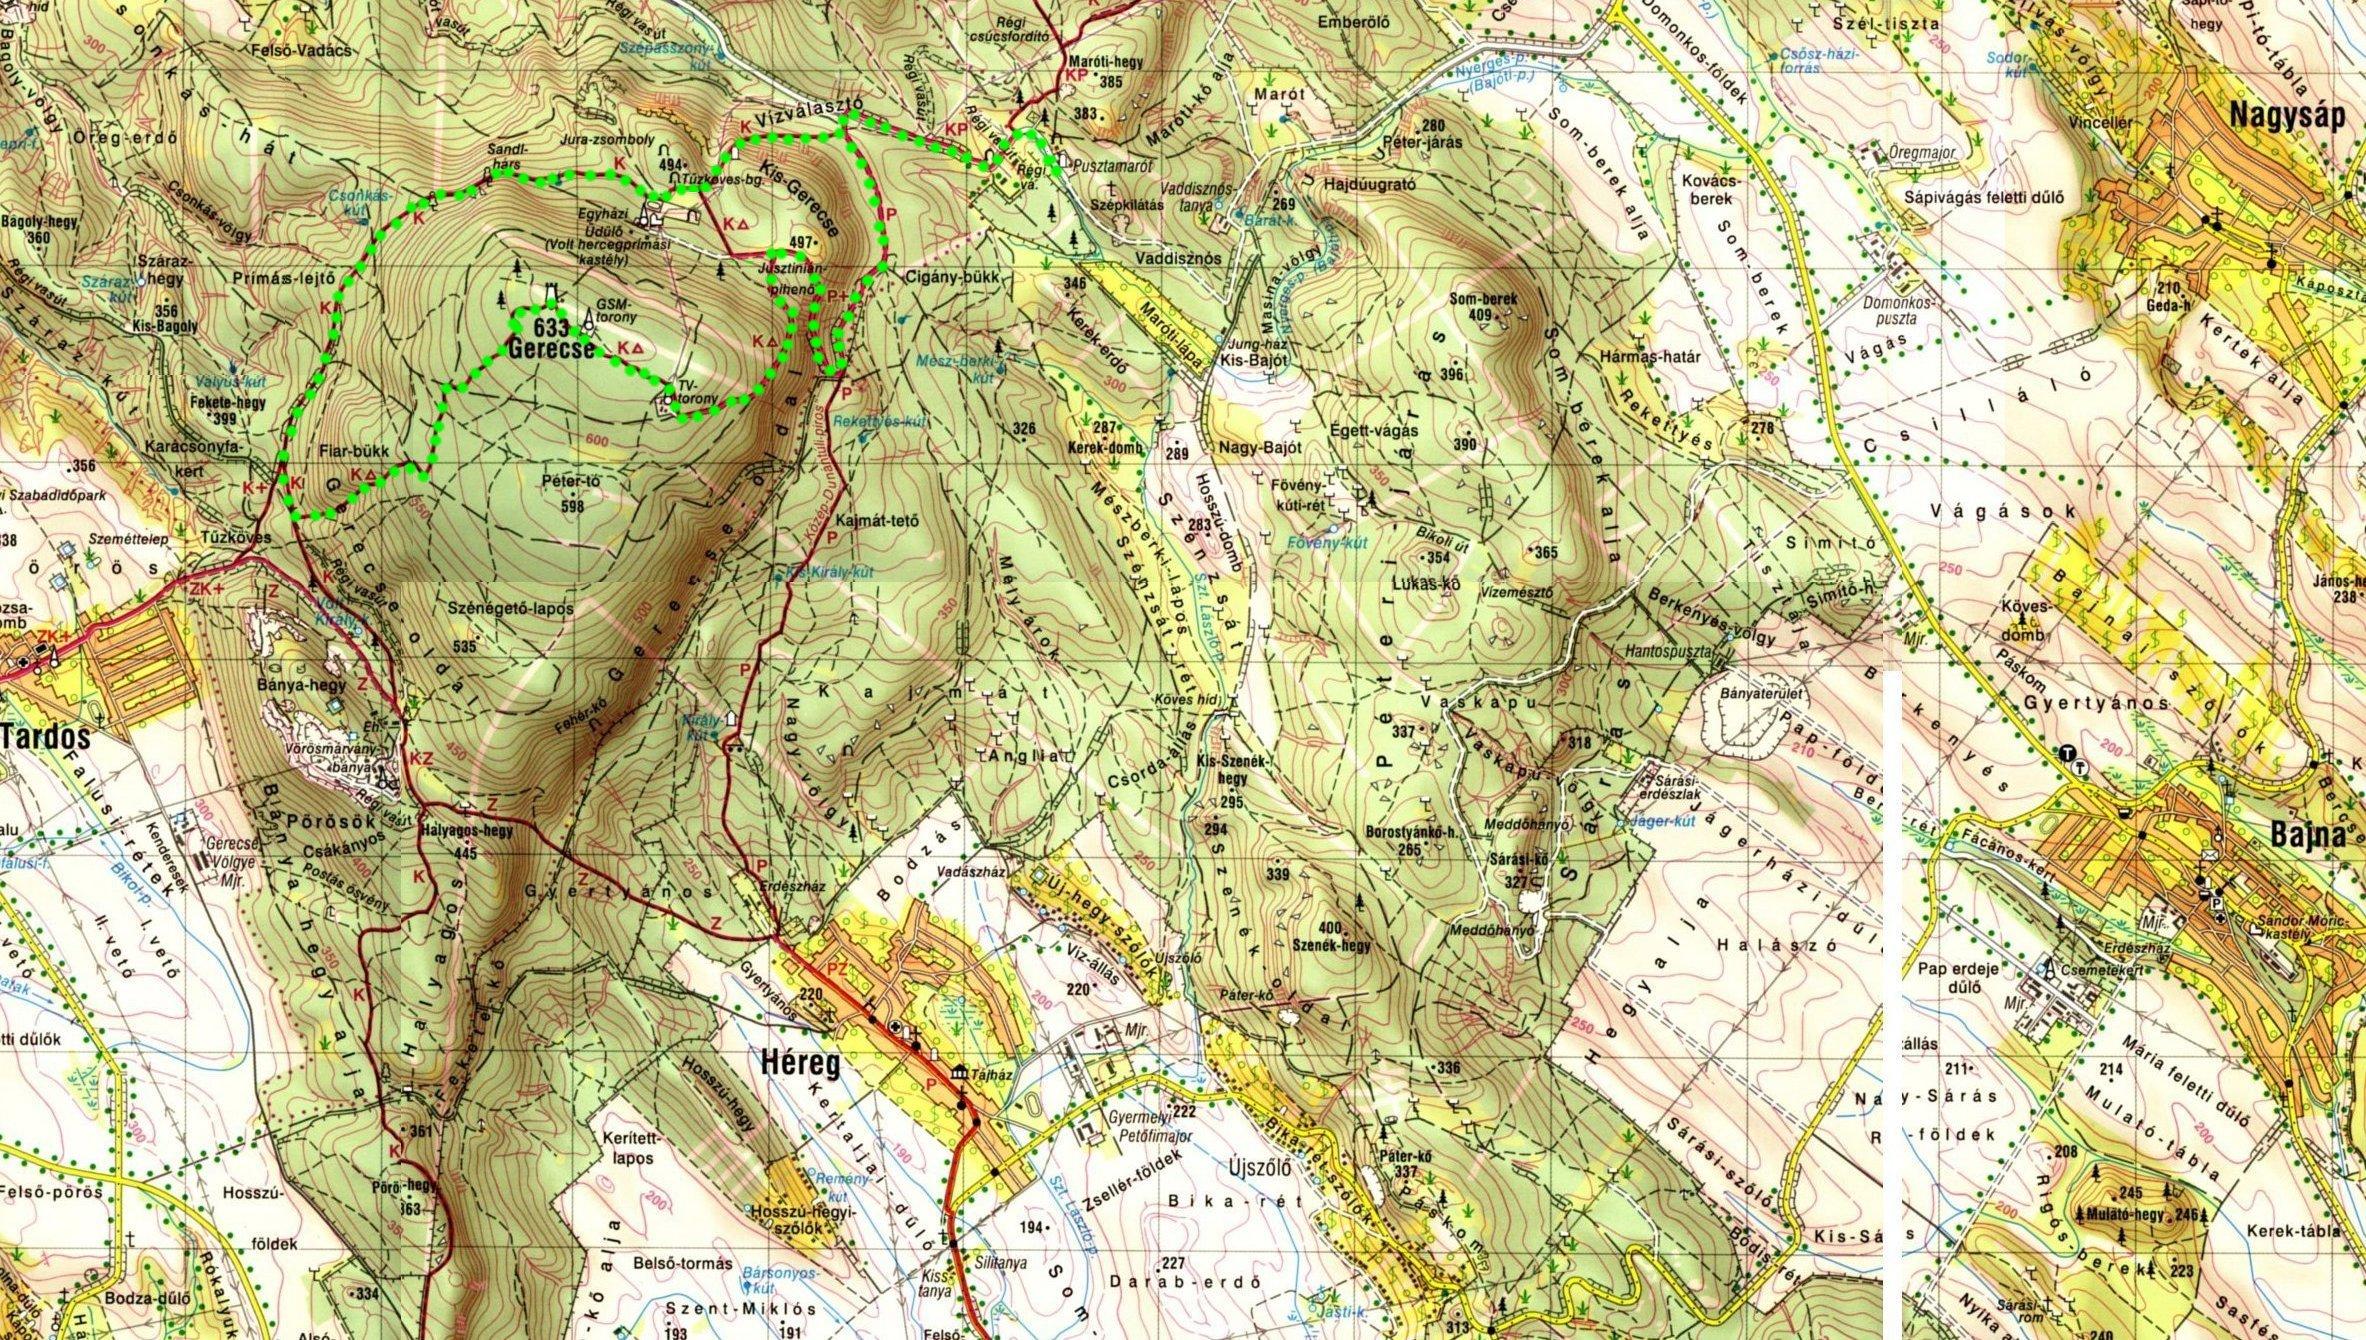 gerecse térkép Gerecse, Hungary gerecse térkép